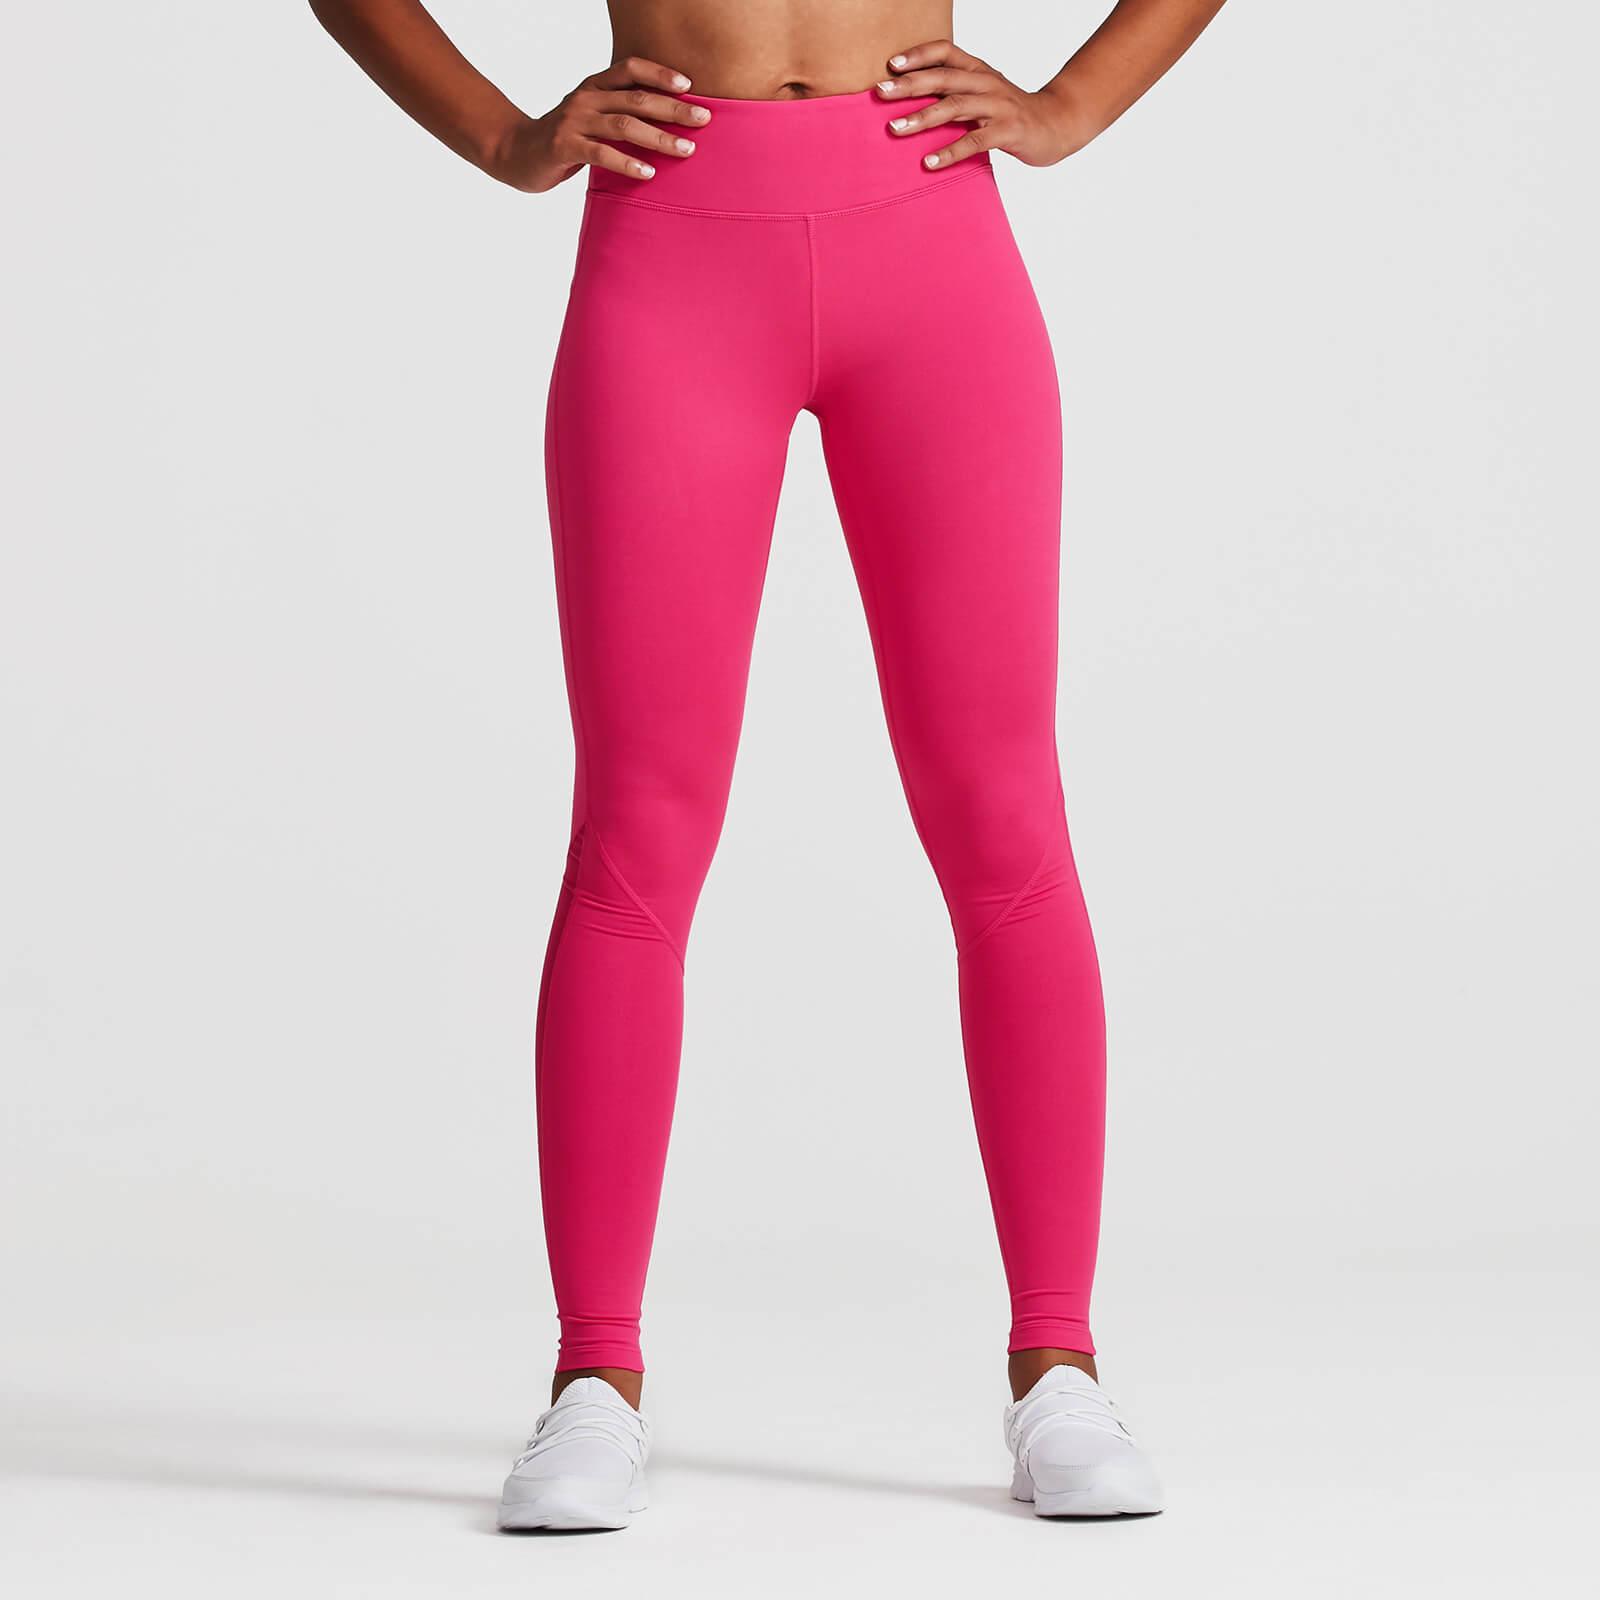 IdealFit Core Full Length Mesh Leggings - S - Pink